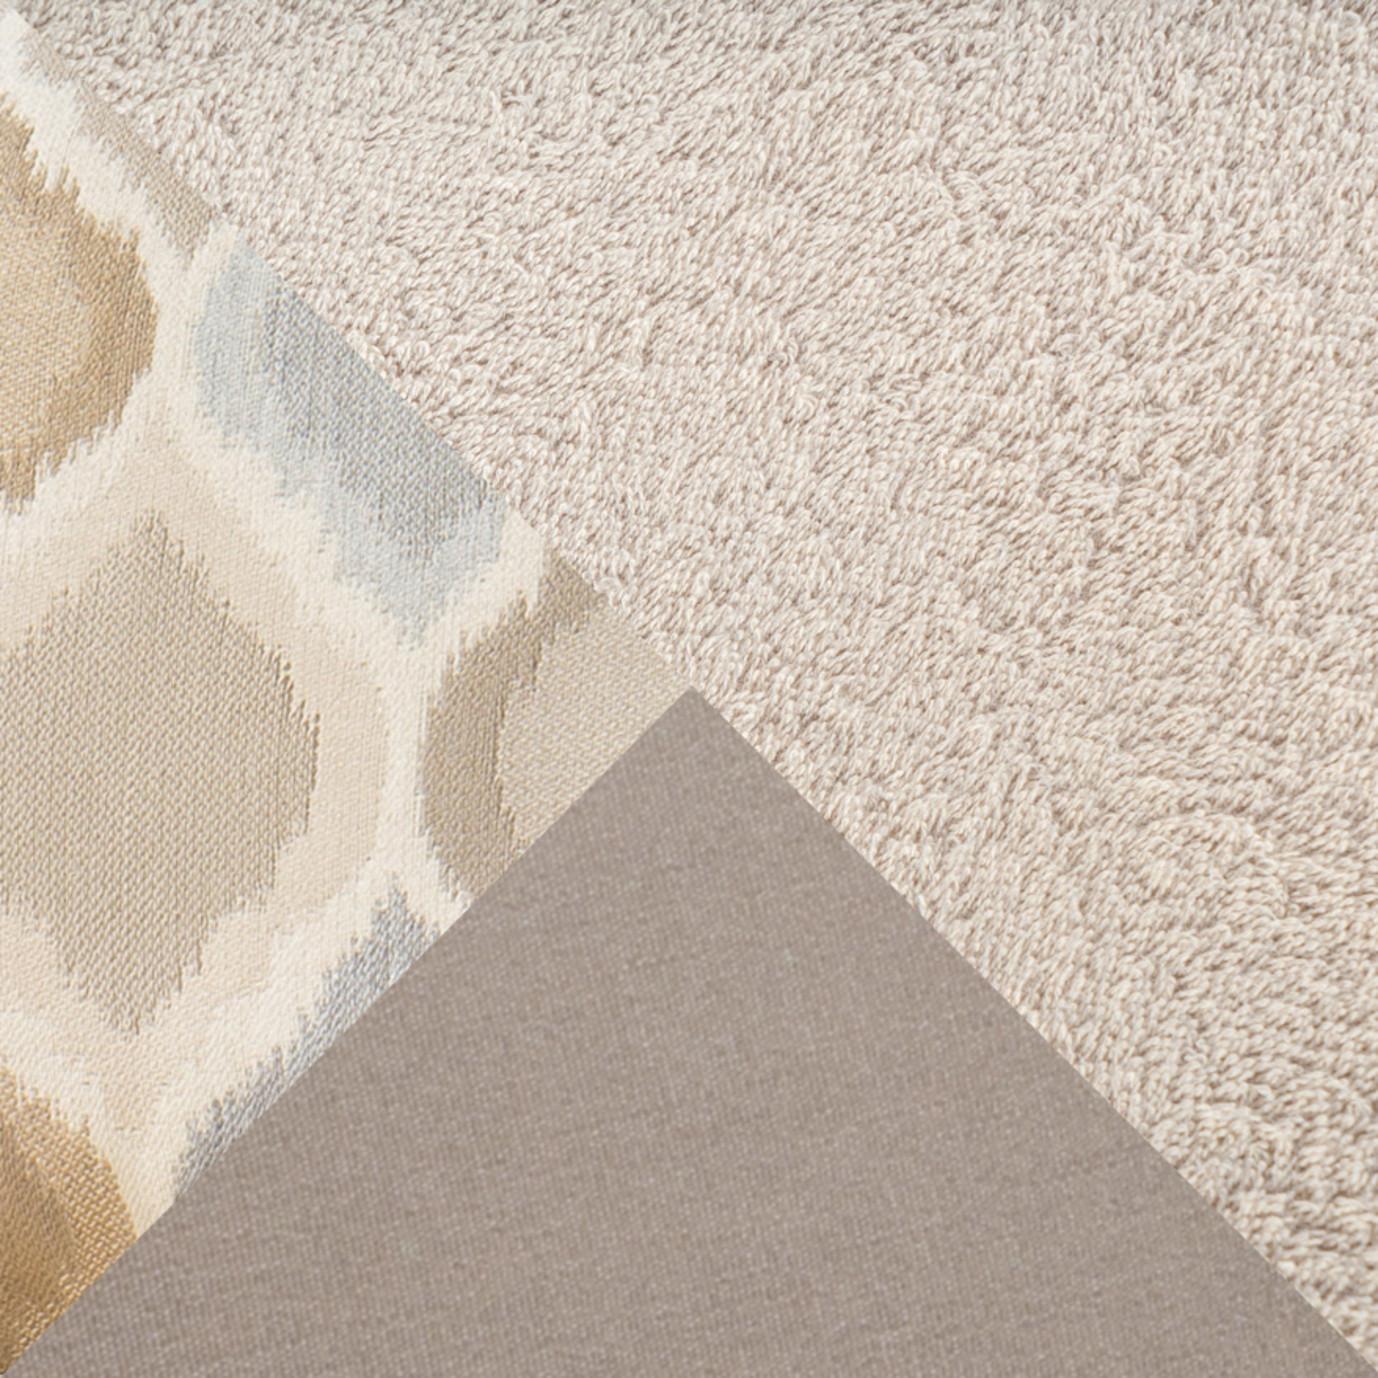 Portofino™ Comfort Sundial Day Bed - Heather Beige